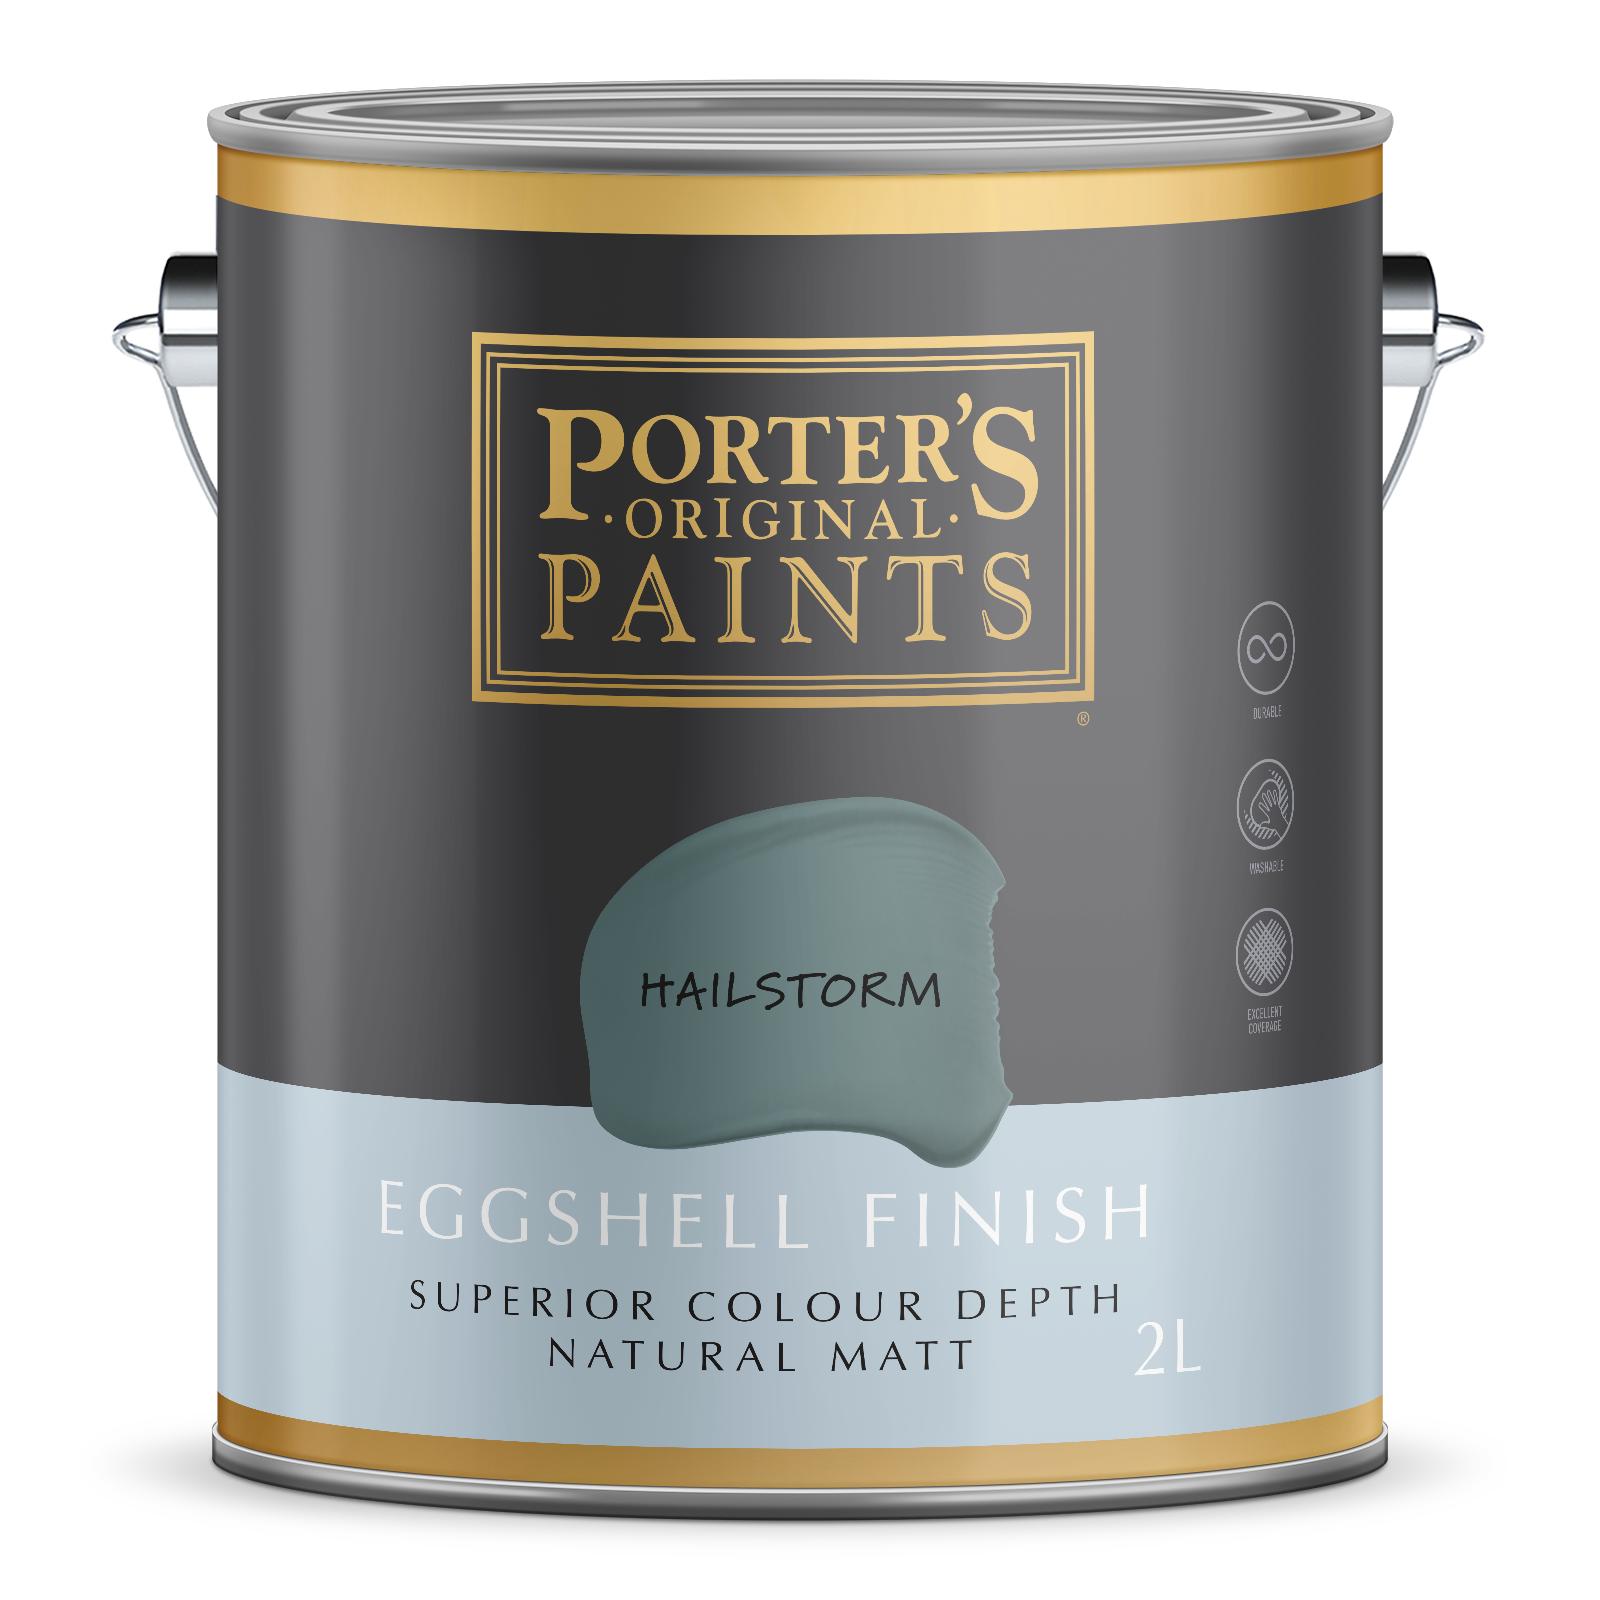 Porter's 2L Hailstorm Eggshell Finish Broadwall Washable Paint